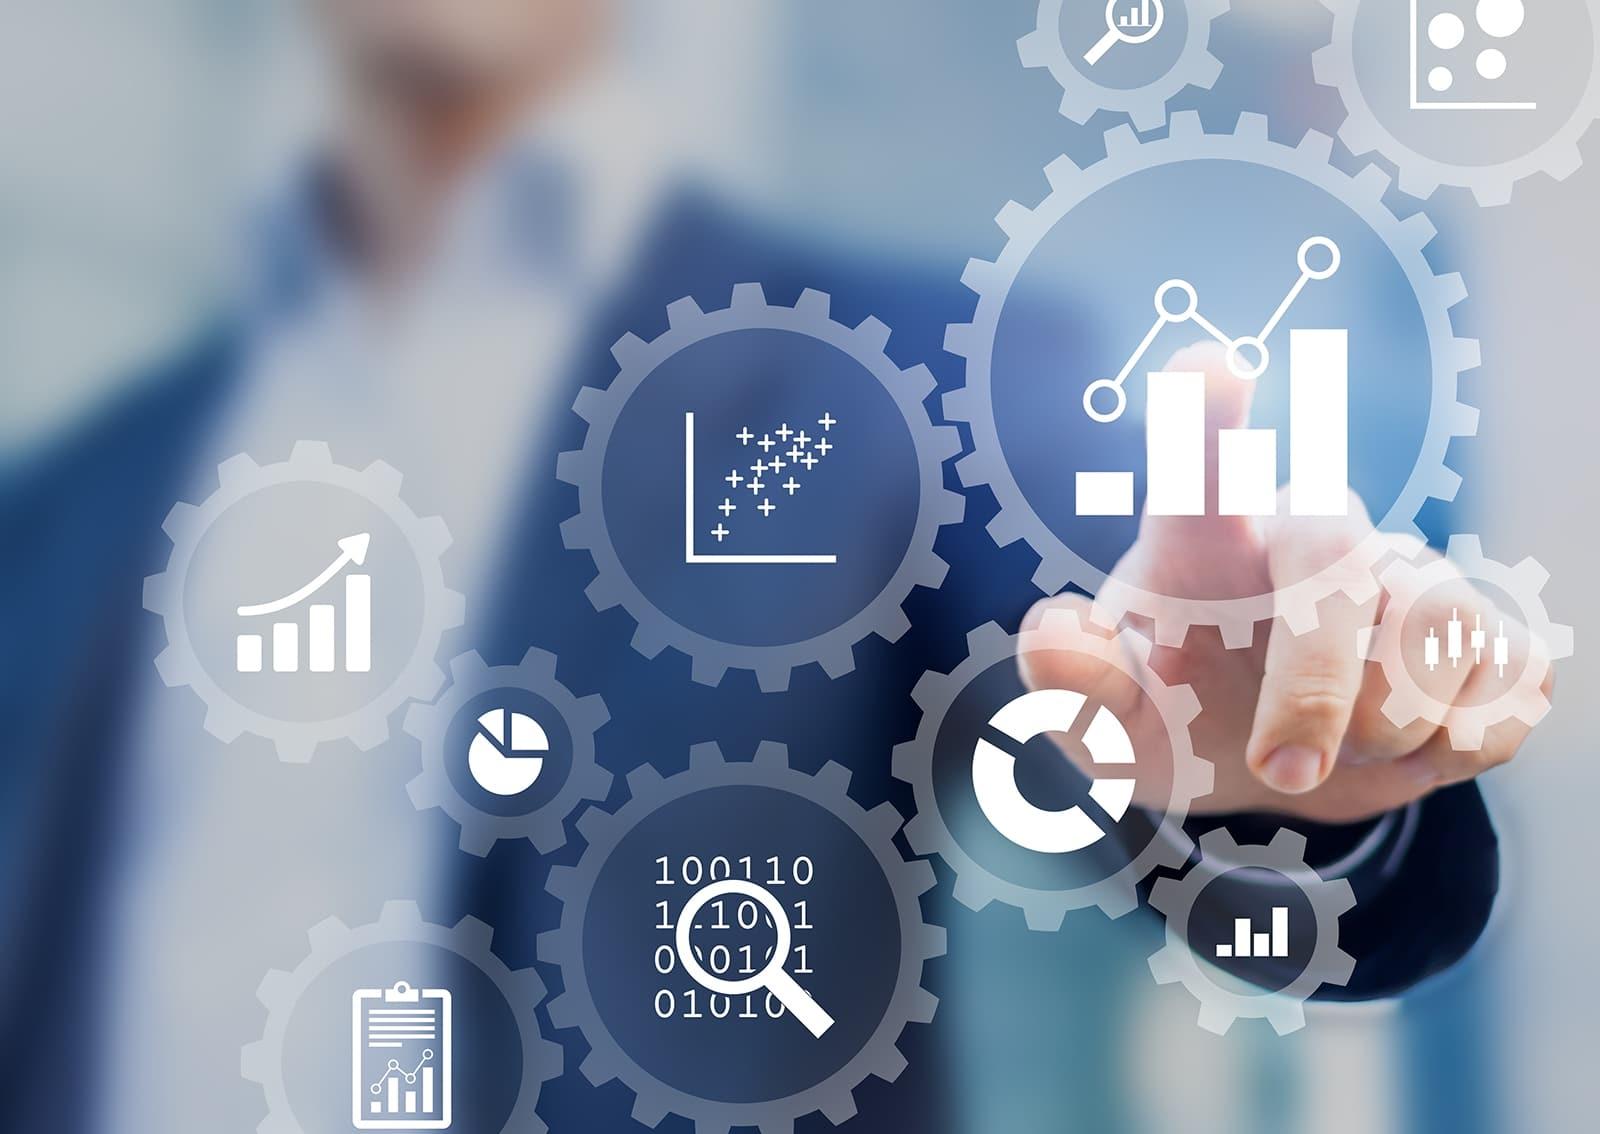 smeup gestione digitale dei processi